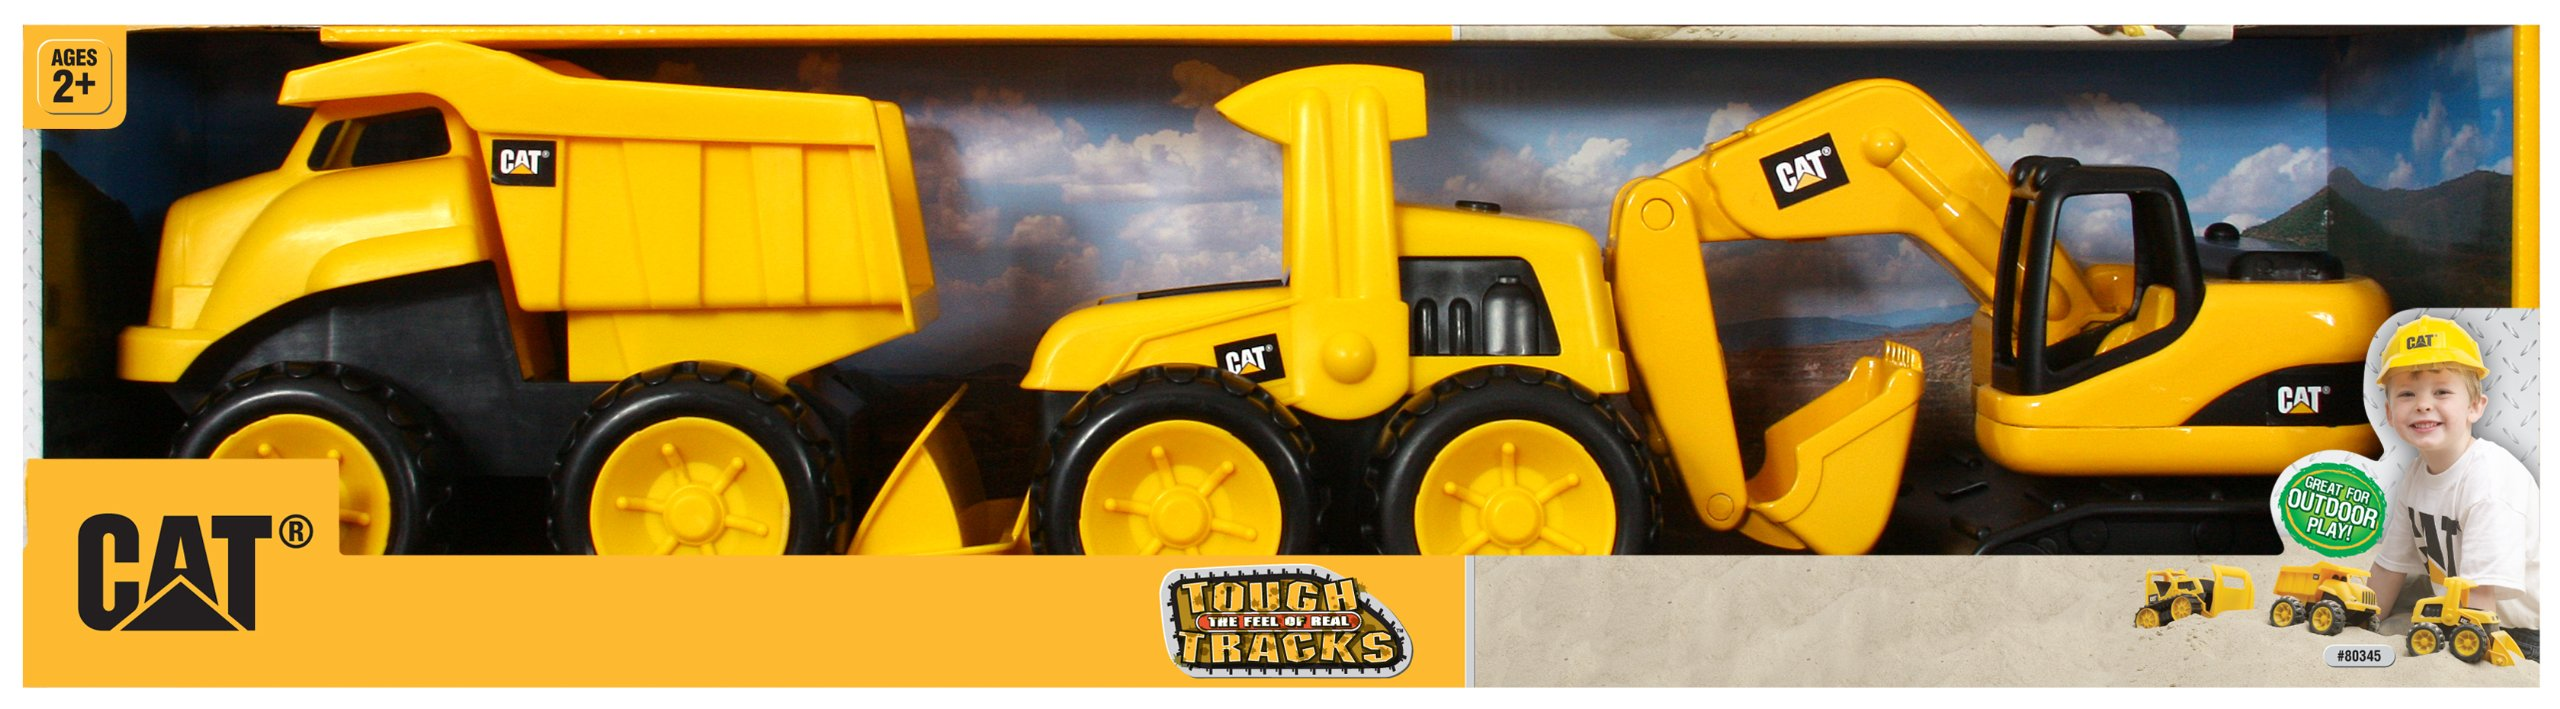 Toy State Caterpillar Tough Tracks, 3 Piece Set